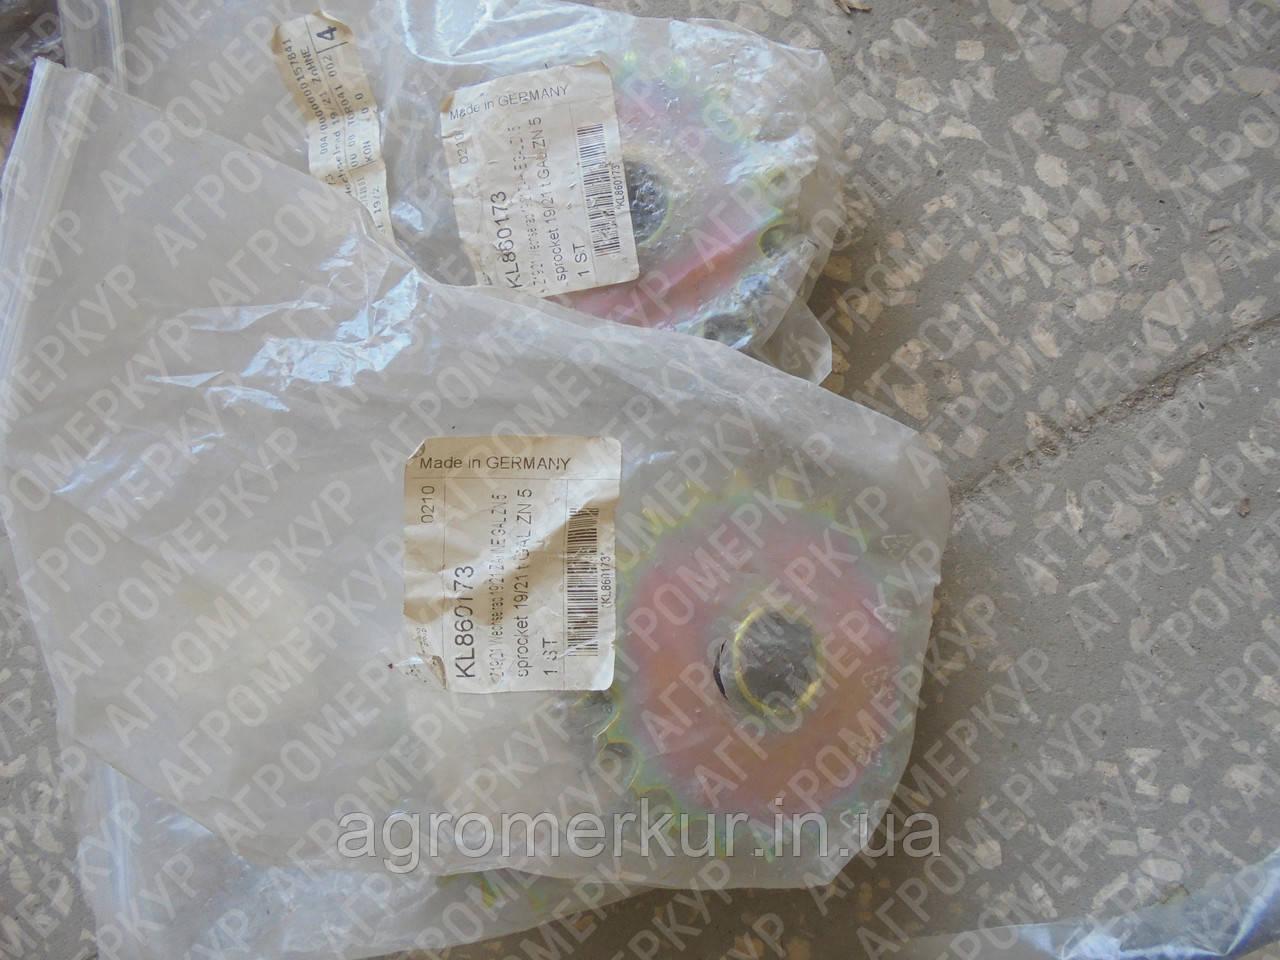 Зірочка Z-19/21 KL860173 Kverneland